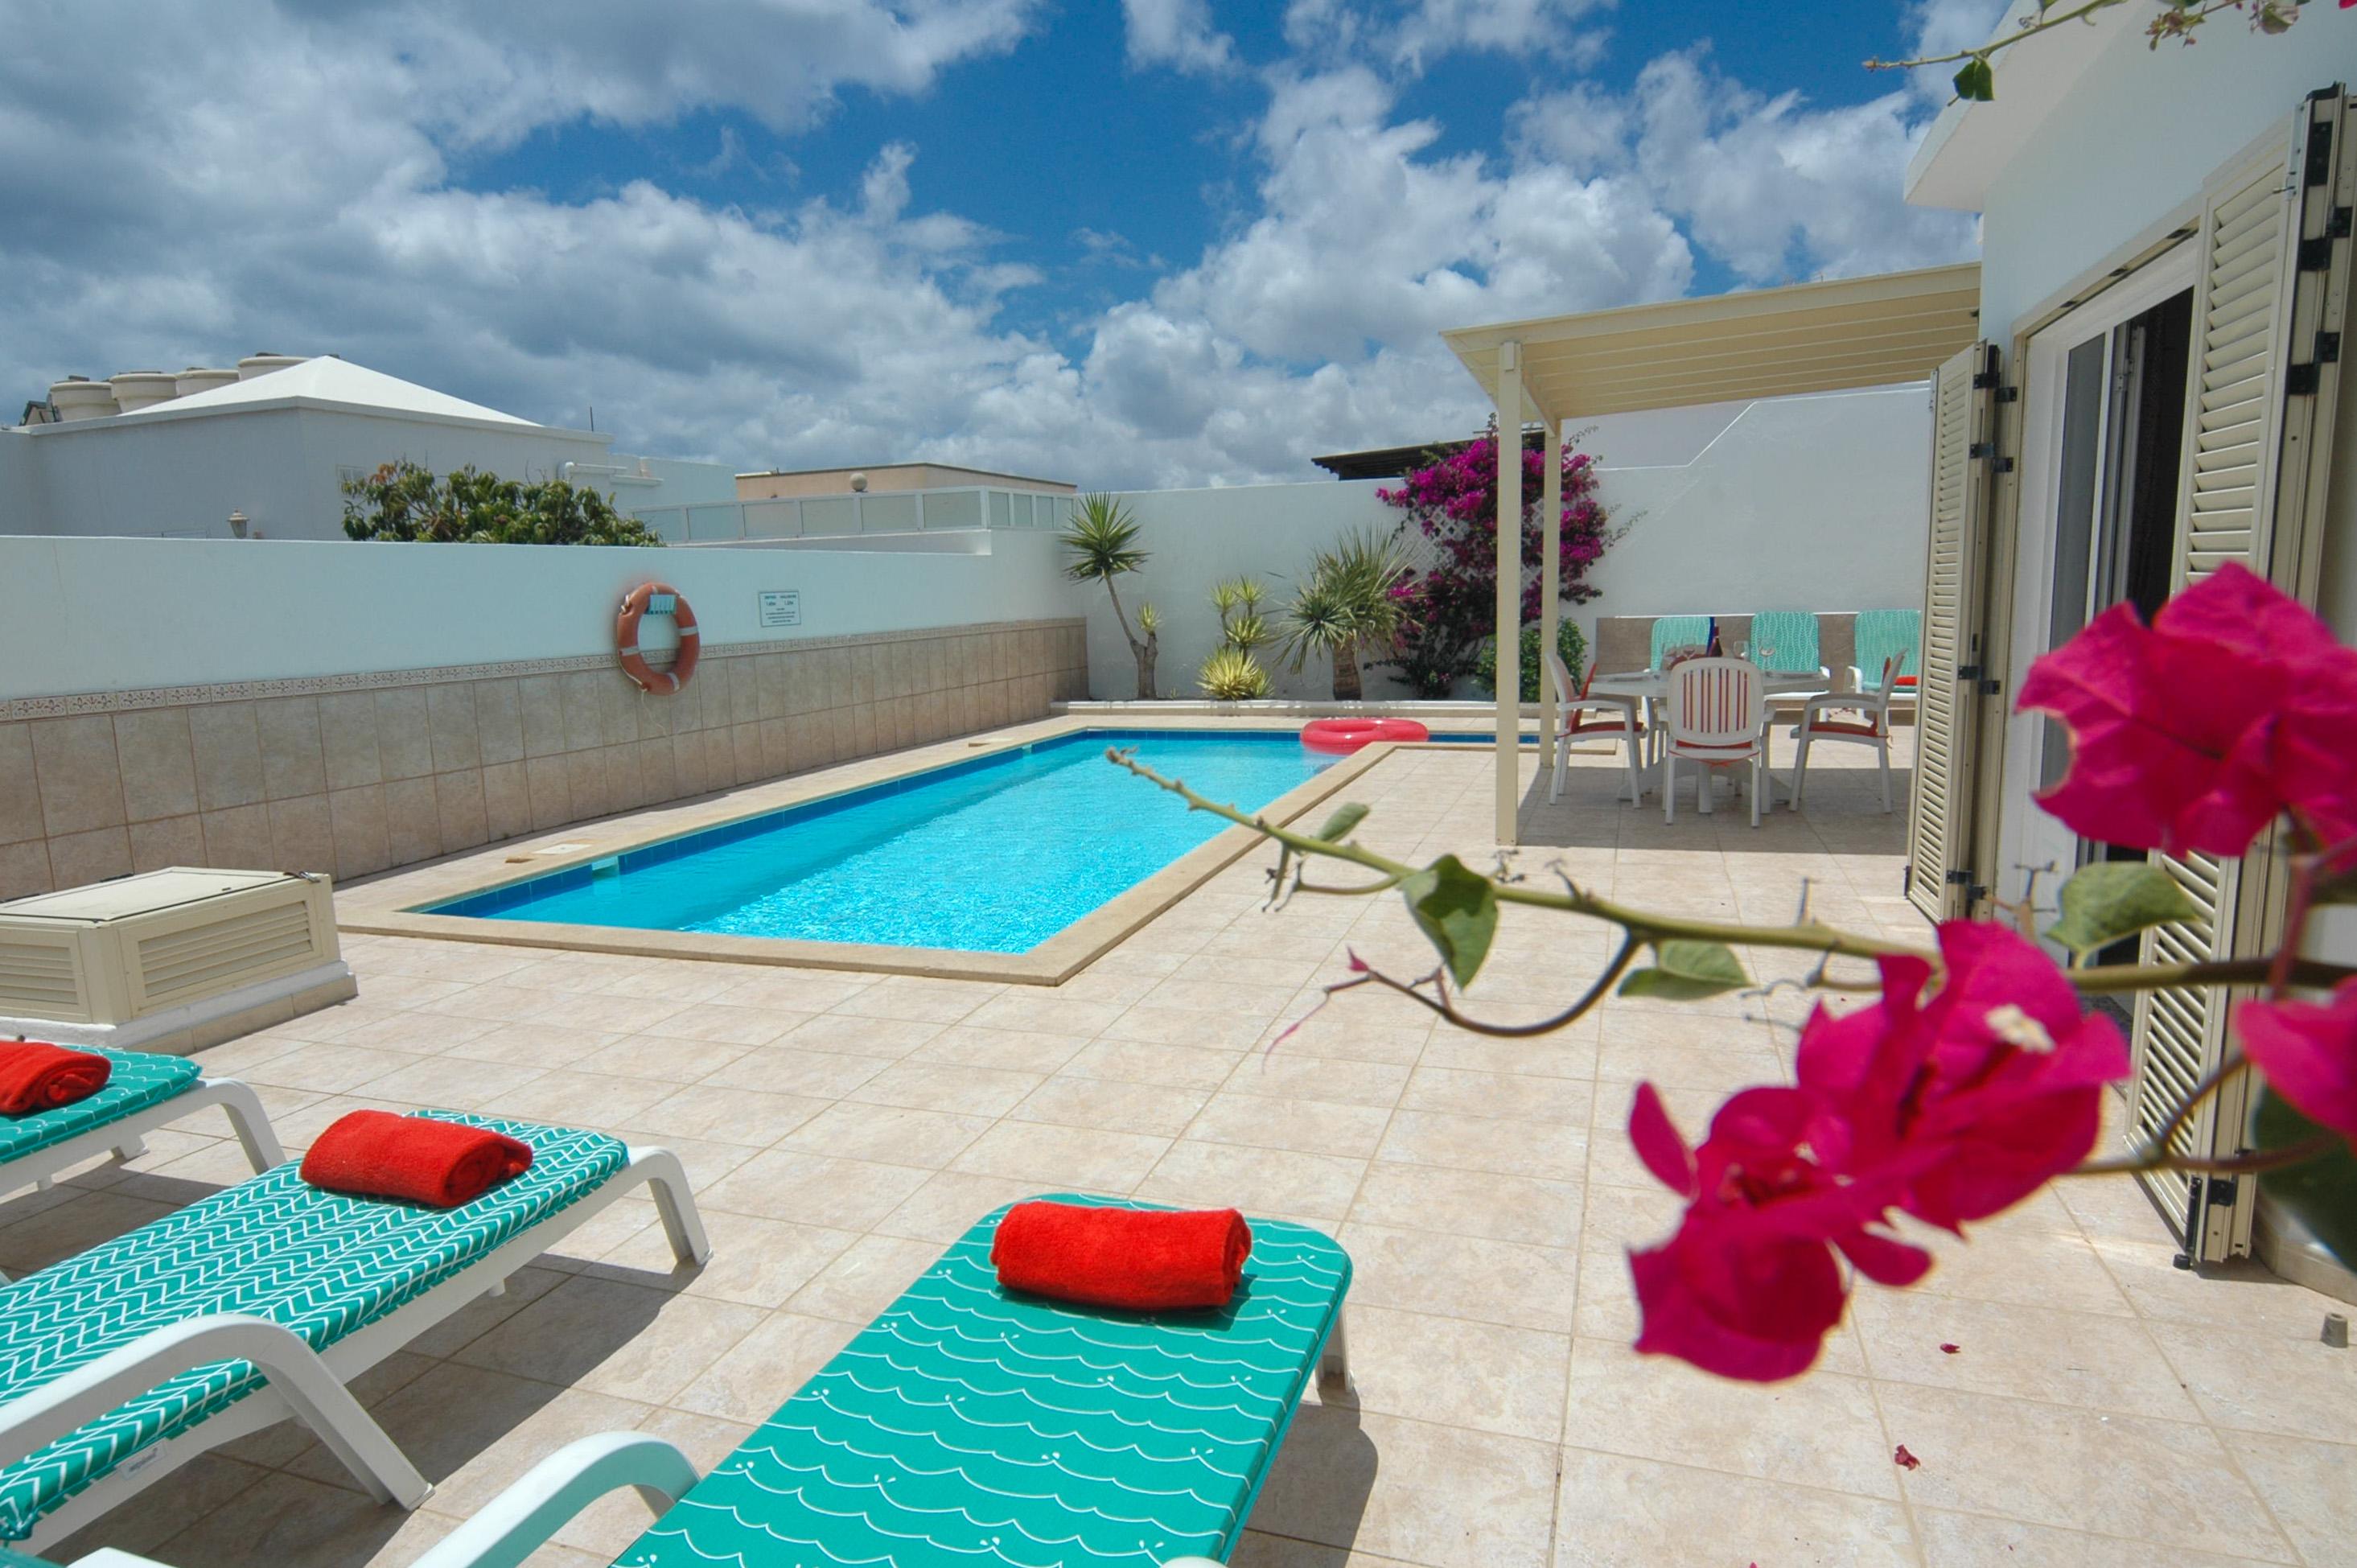 LVC212405 Sunbathing by the pool